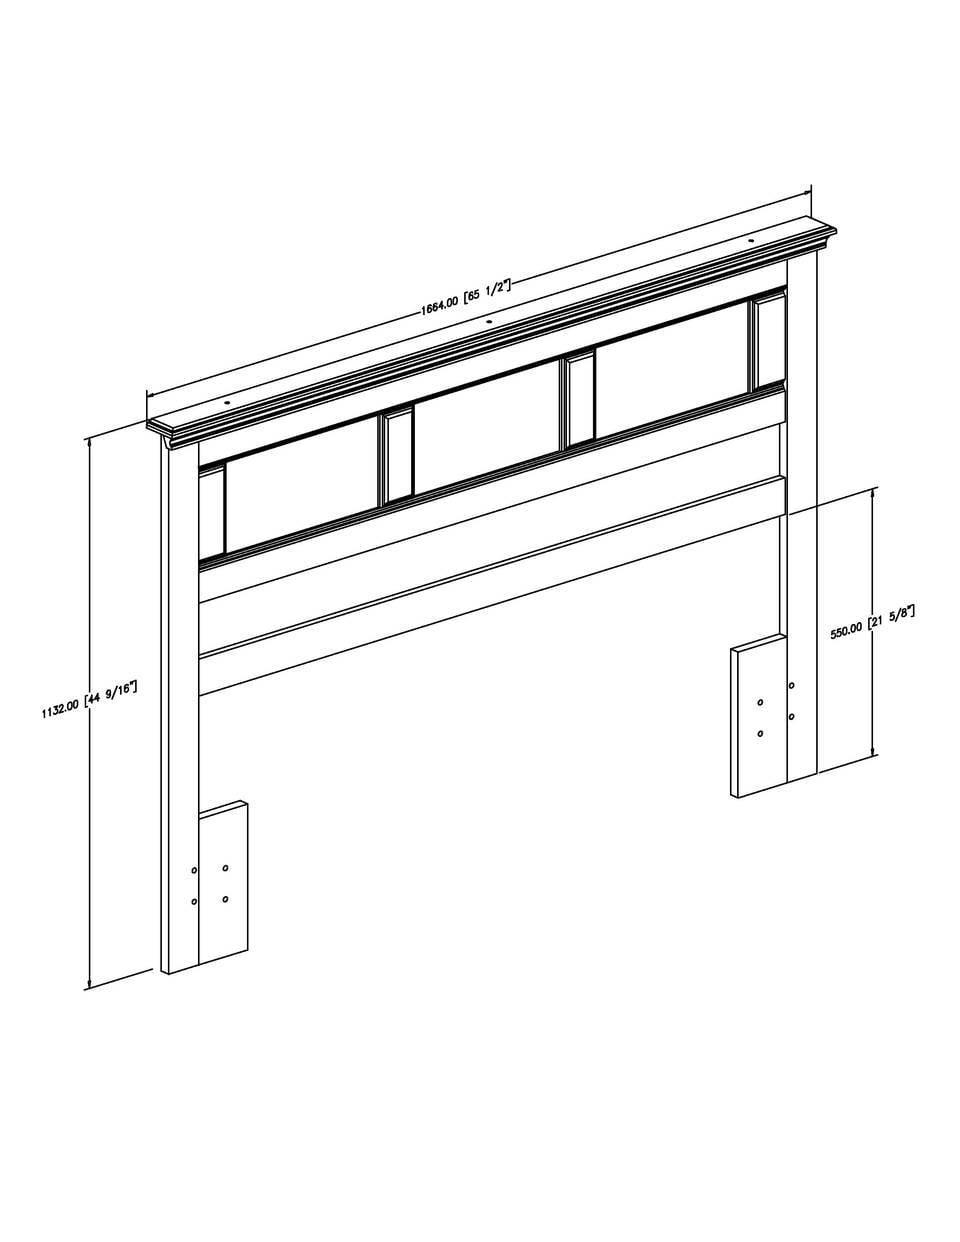 Product Measurements Image